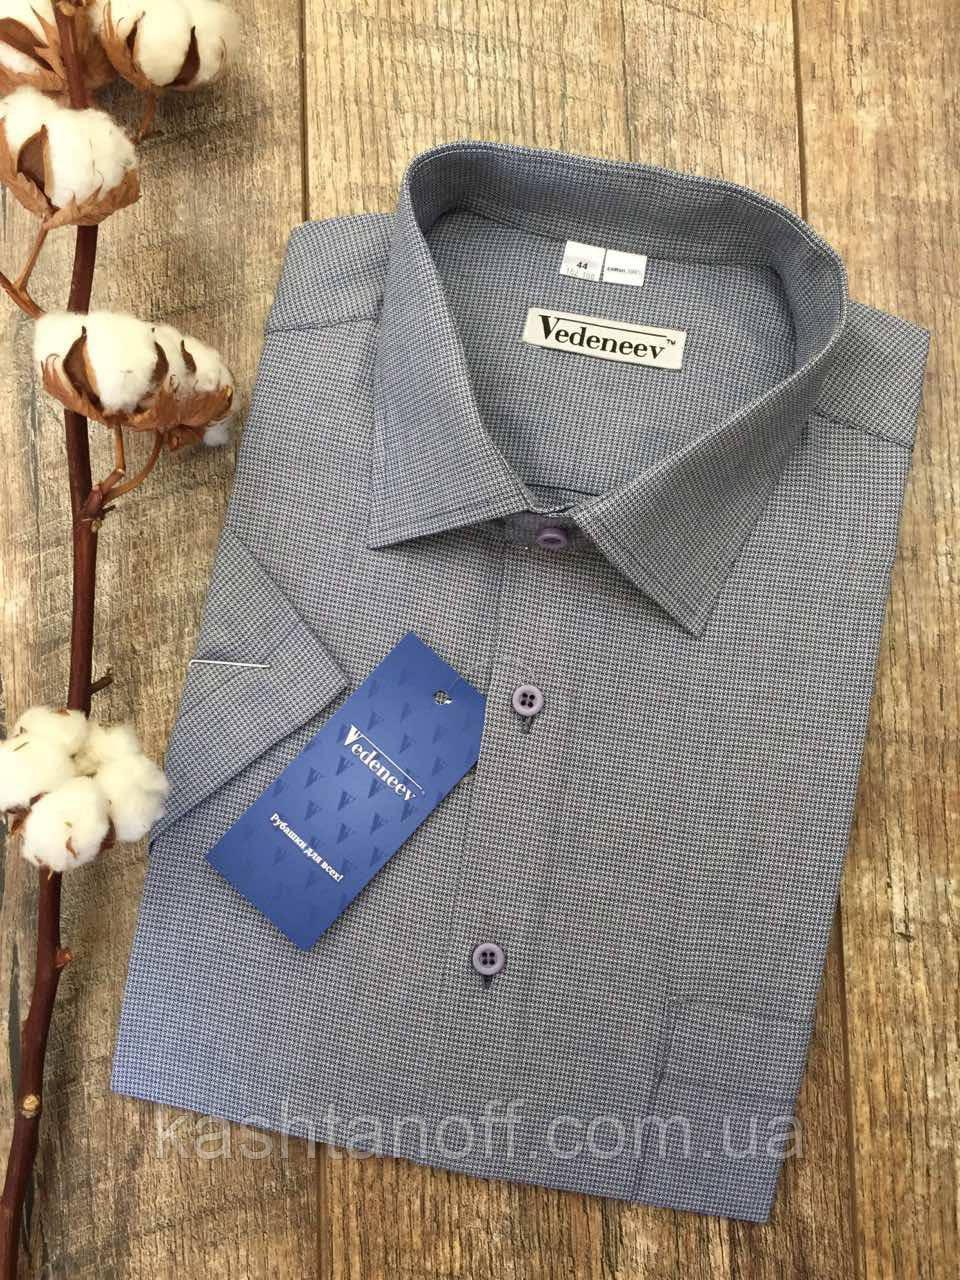 Мужская рубашка с коротким рукавом меланж джинсового цвета